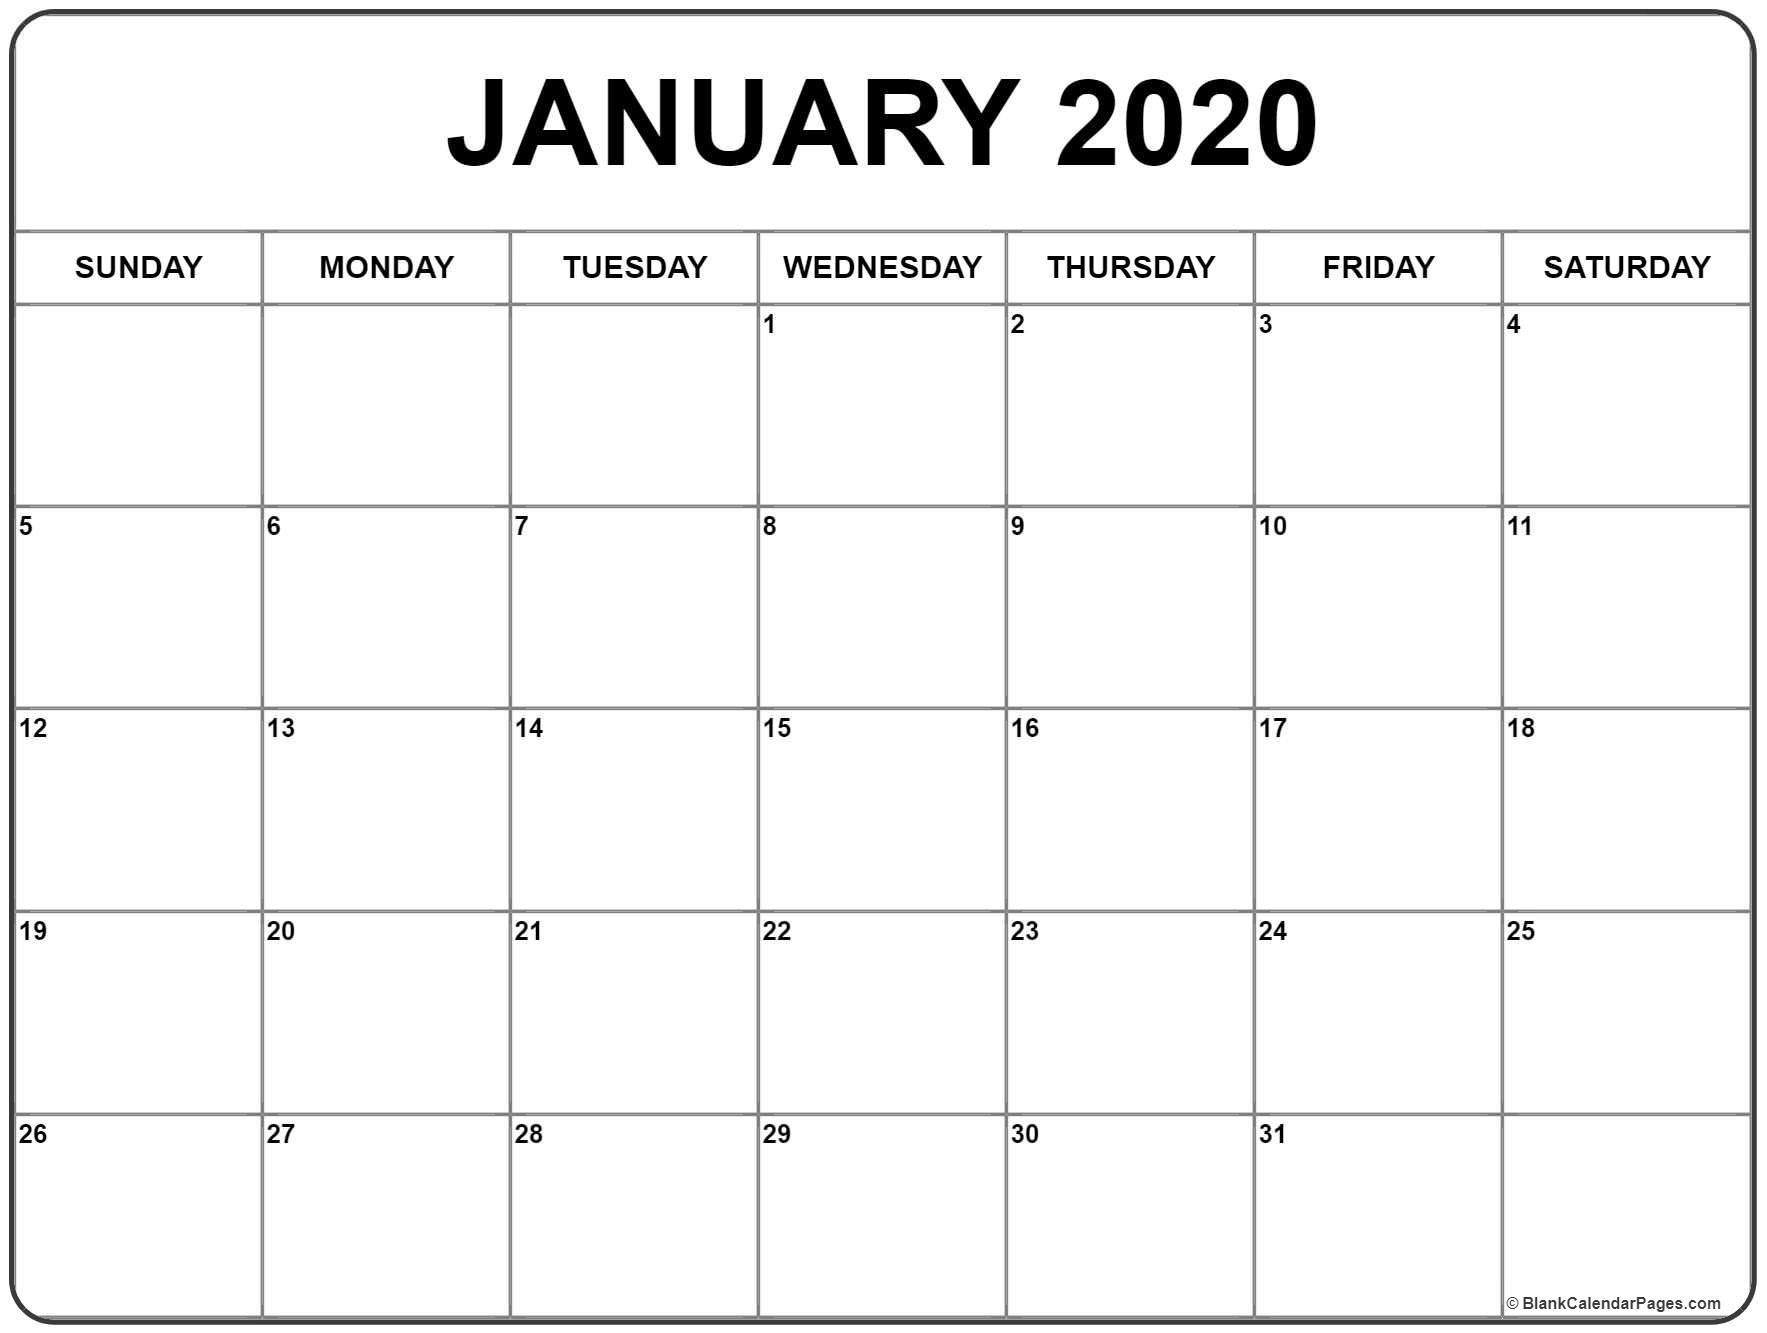 Calendar 2020 January Printable January 2020 Calendar Monthly